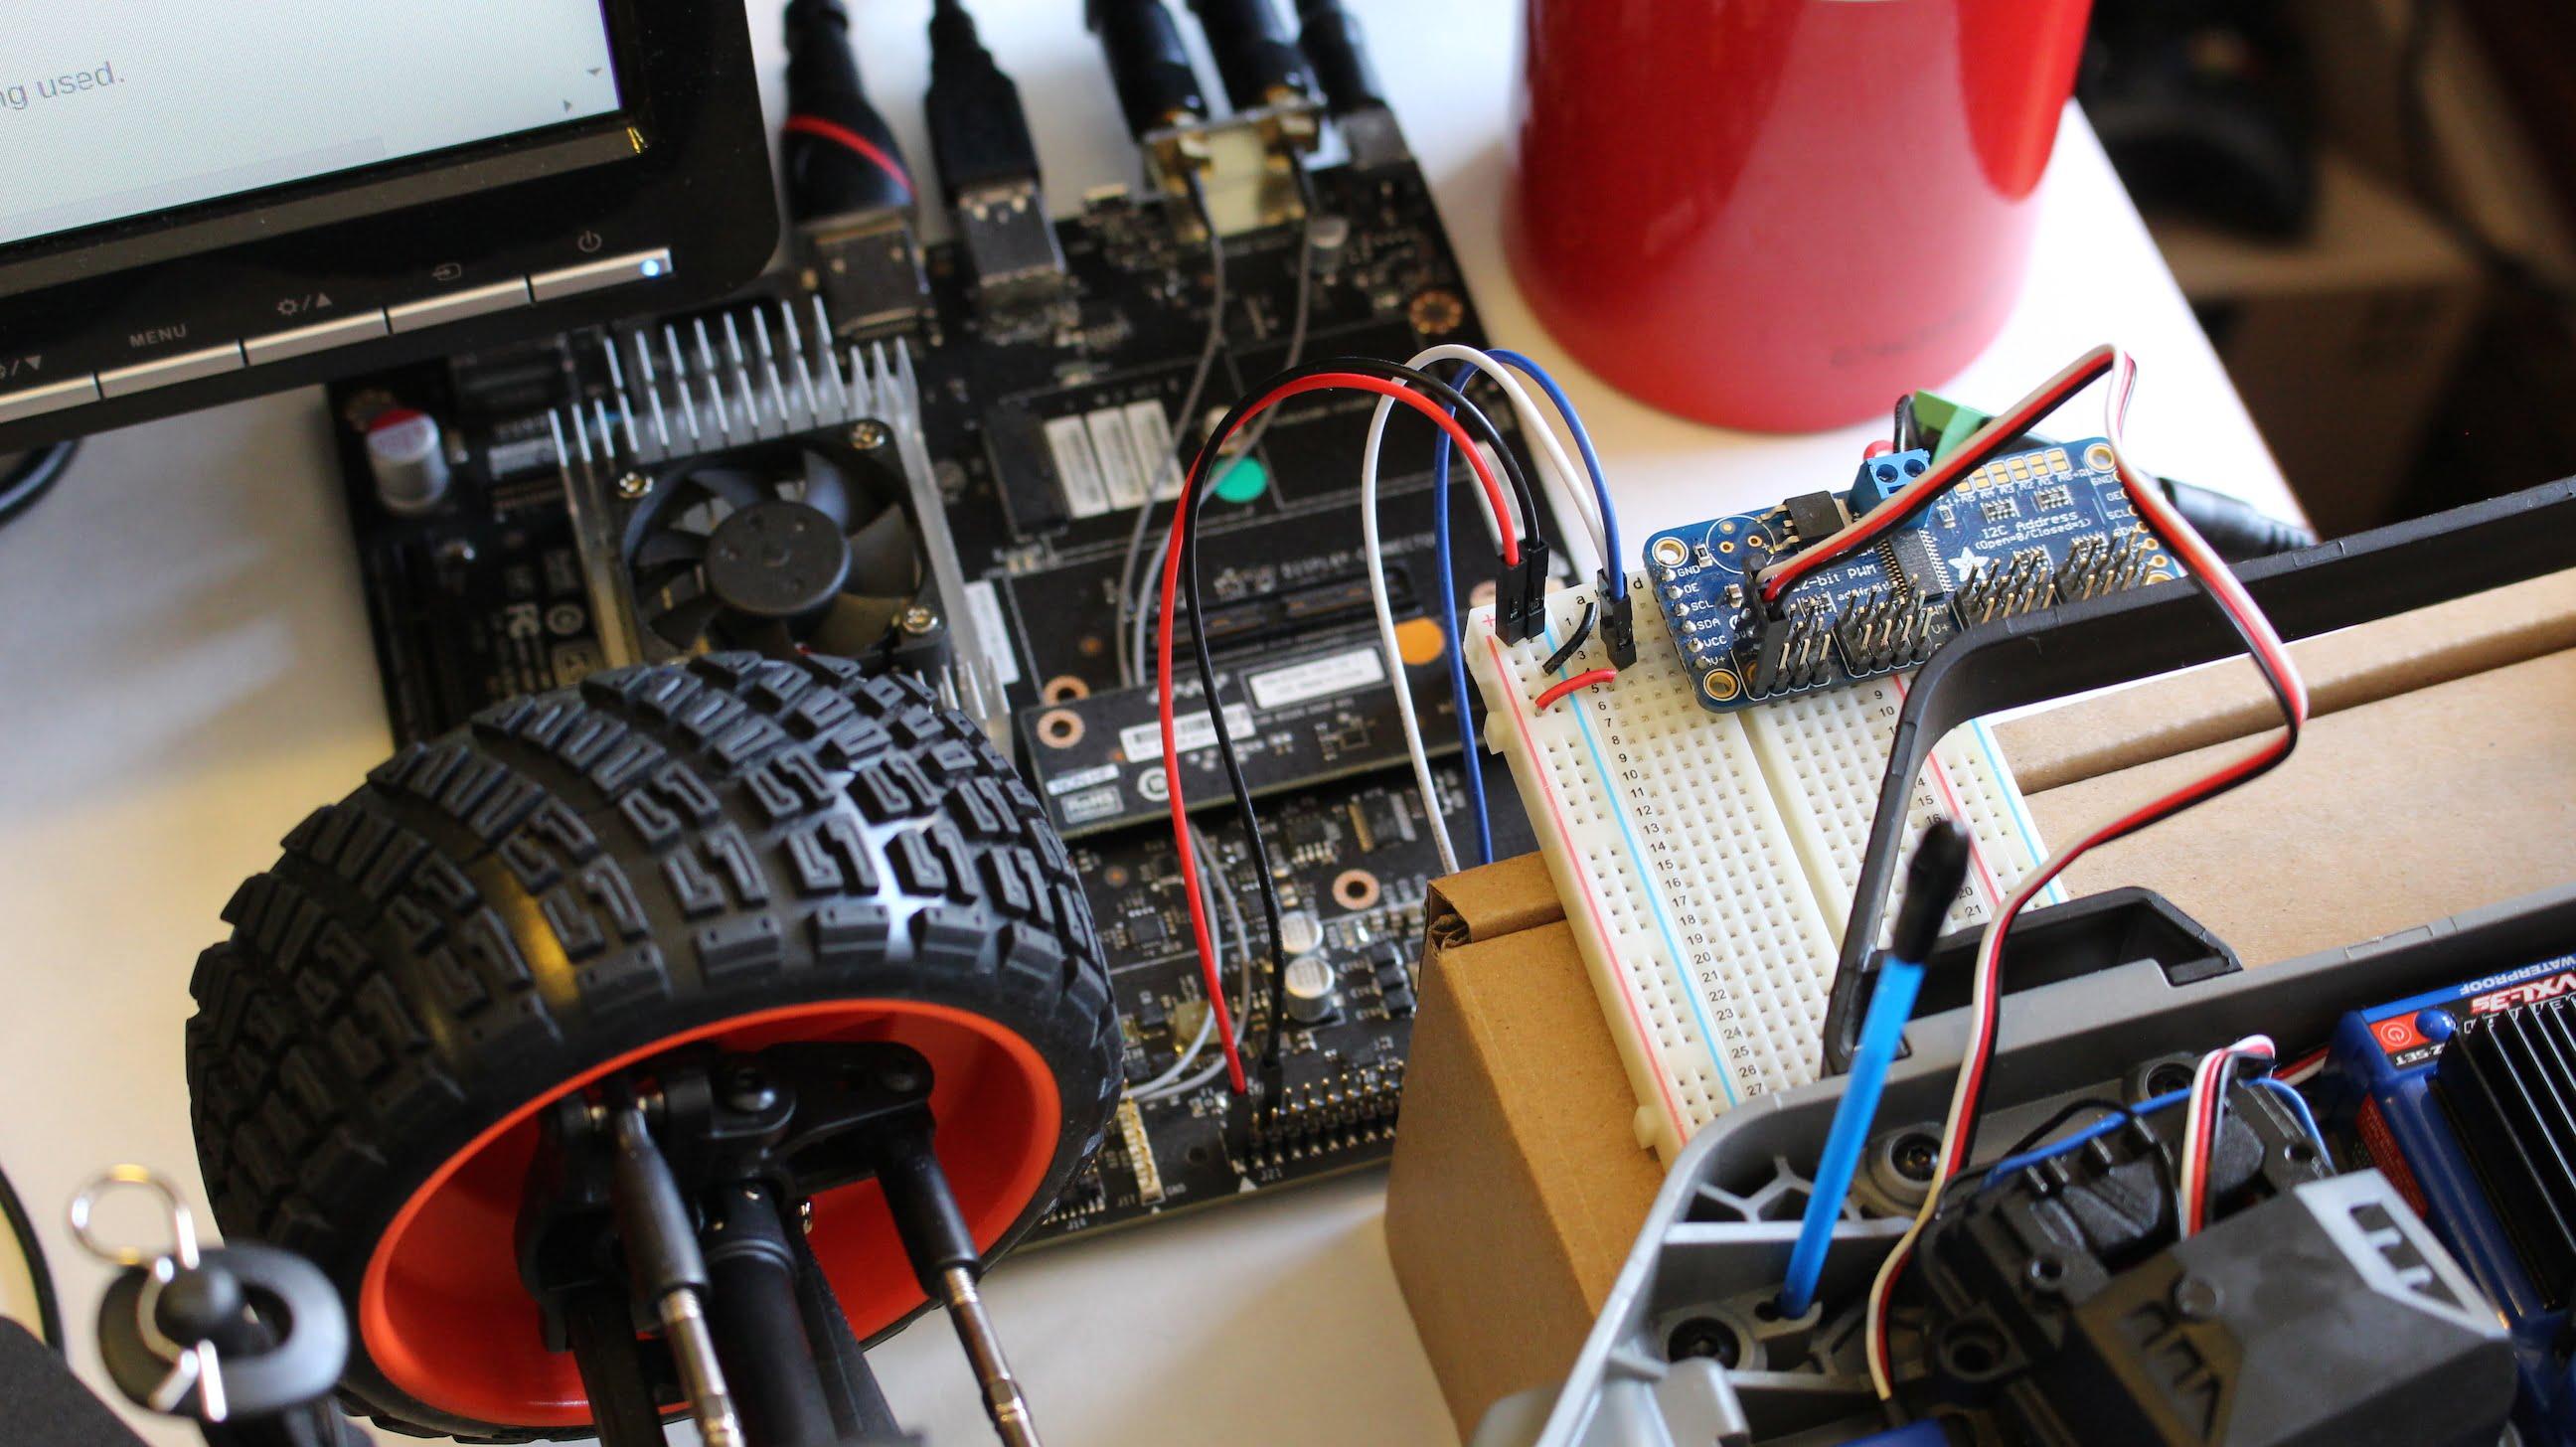 Jetson Traxxas Steering Interface